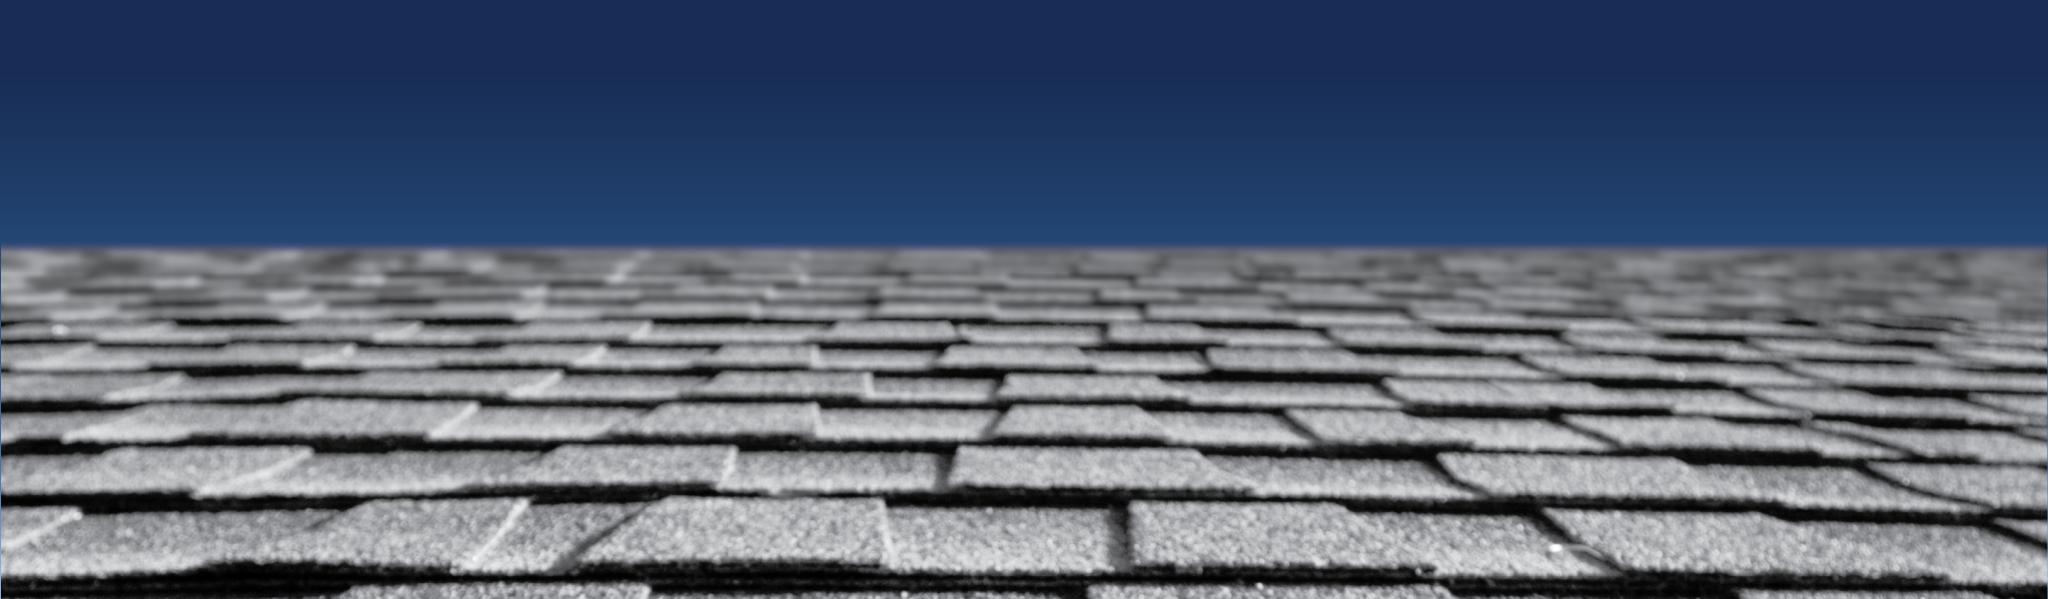 Roof Slider